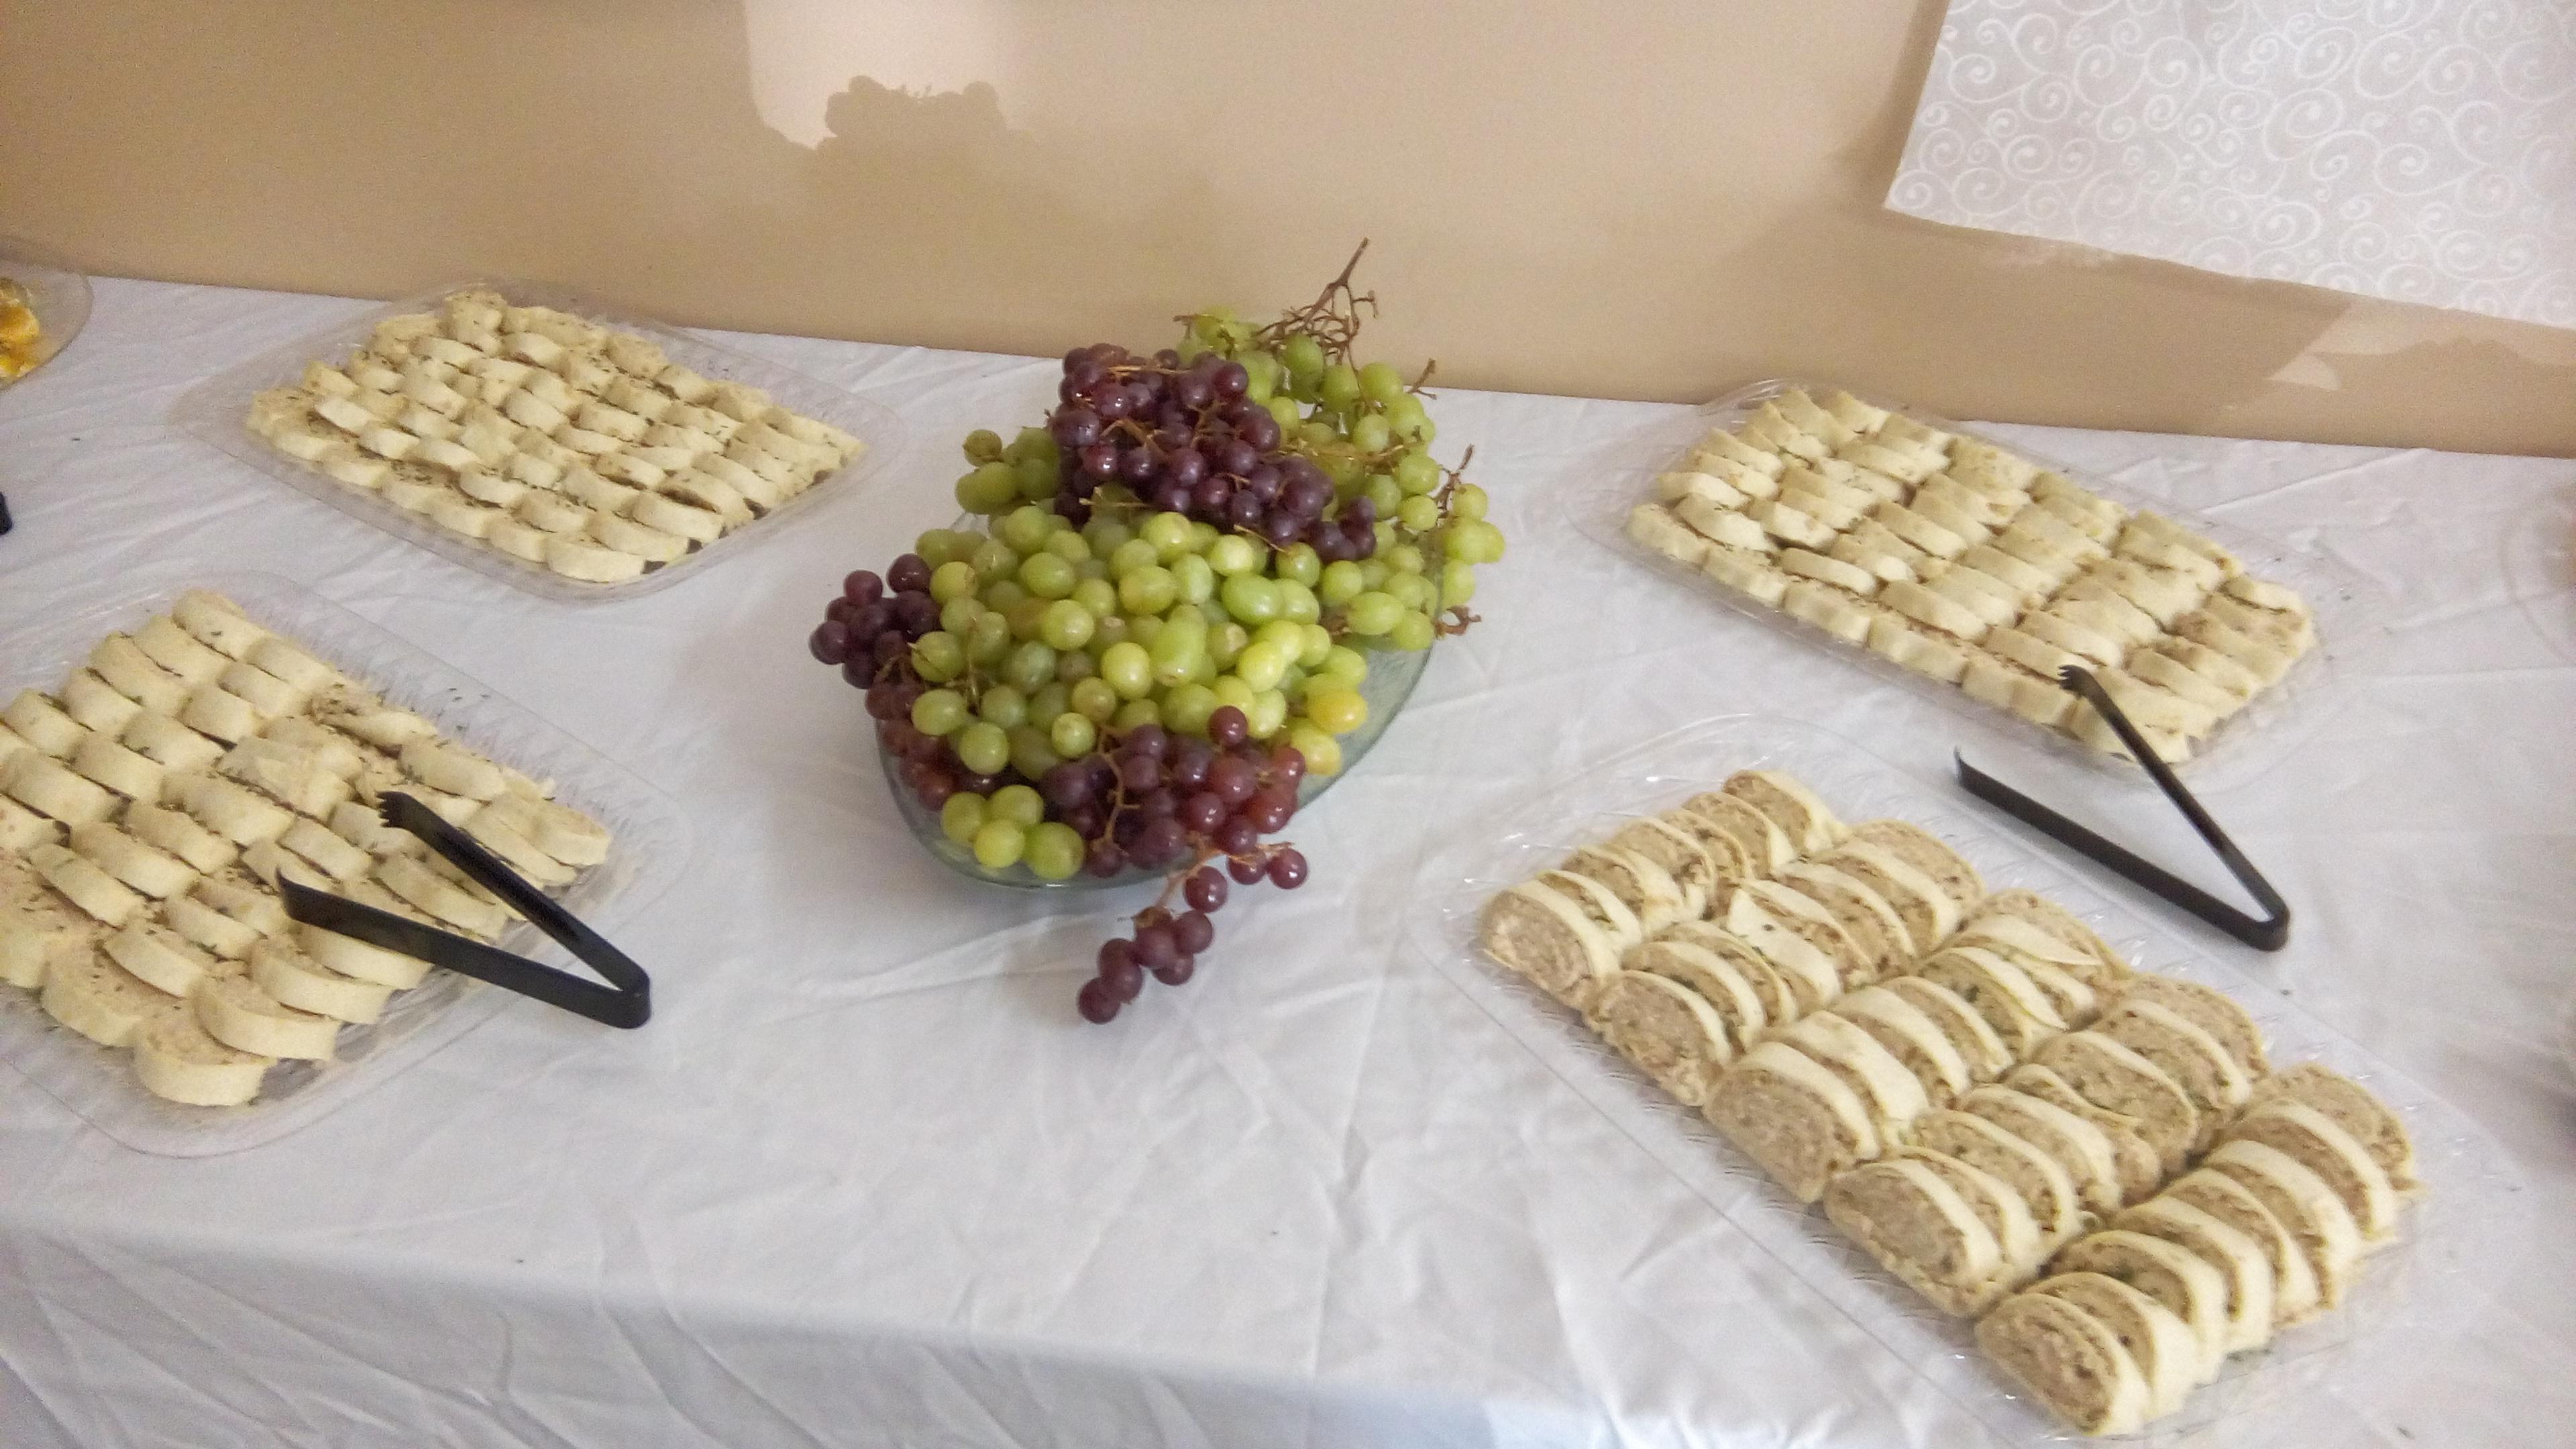 Food for wedding